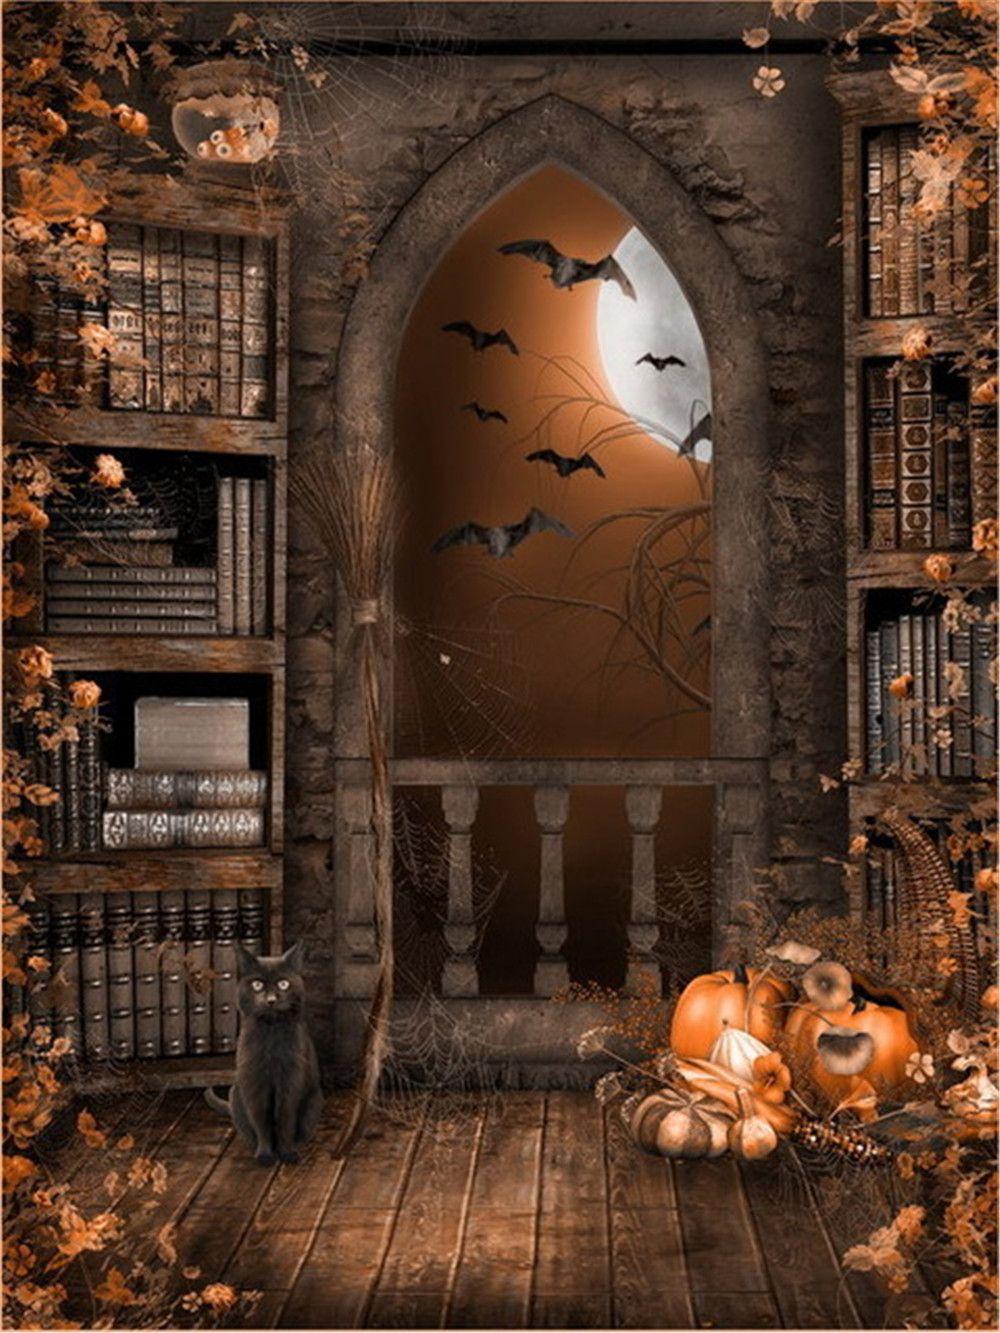 2018 Vintage Castle Indoor Bookshelf Photo Backgrounds